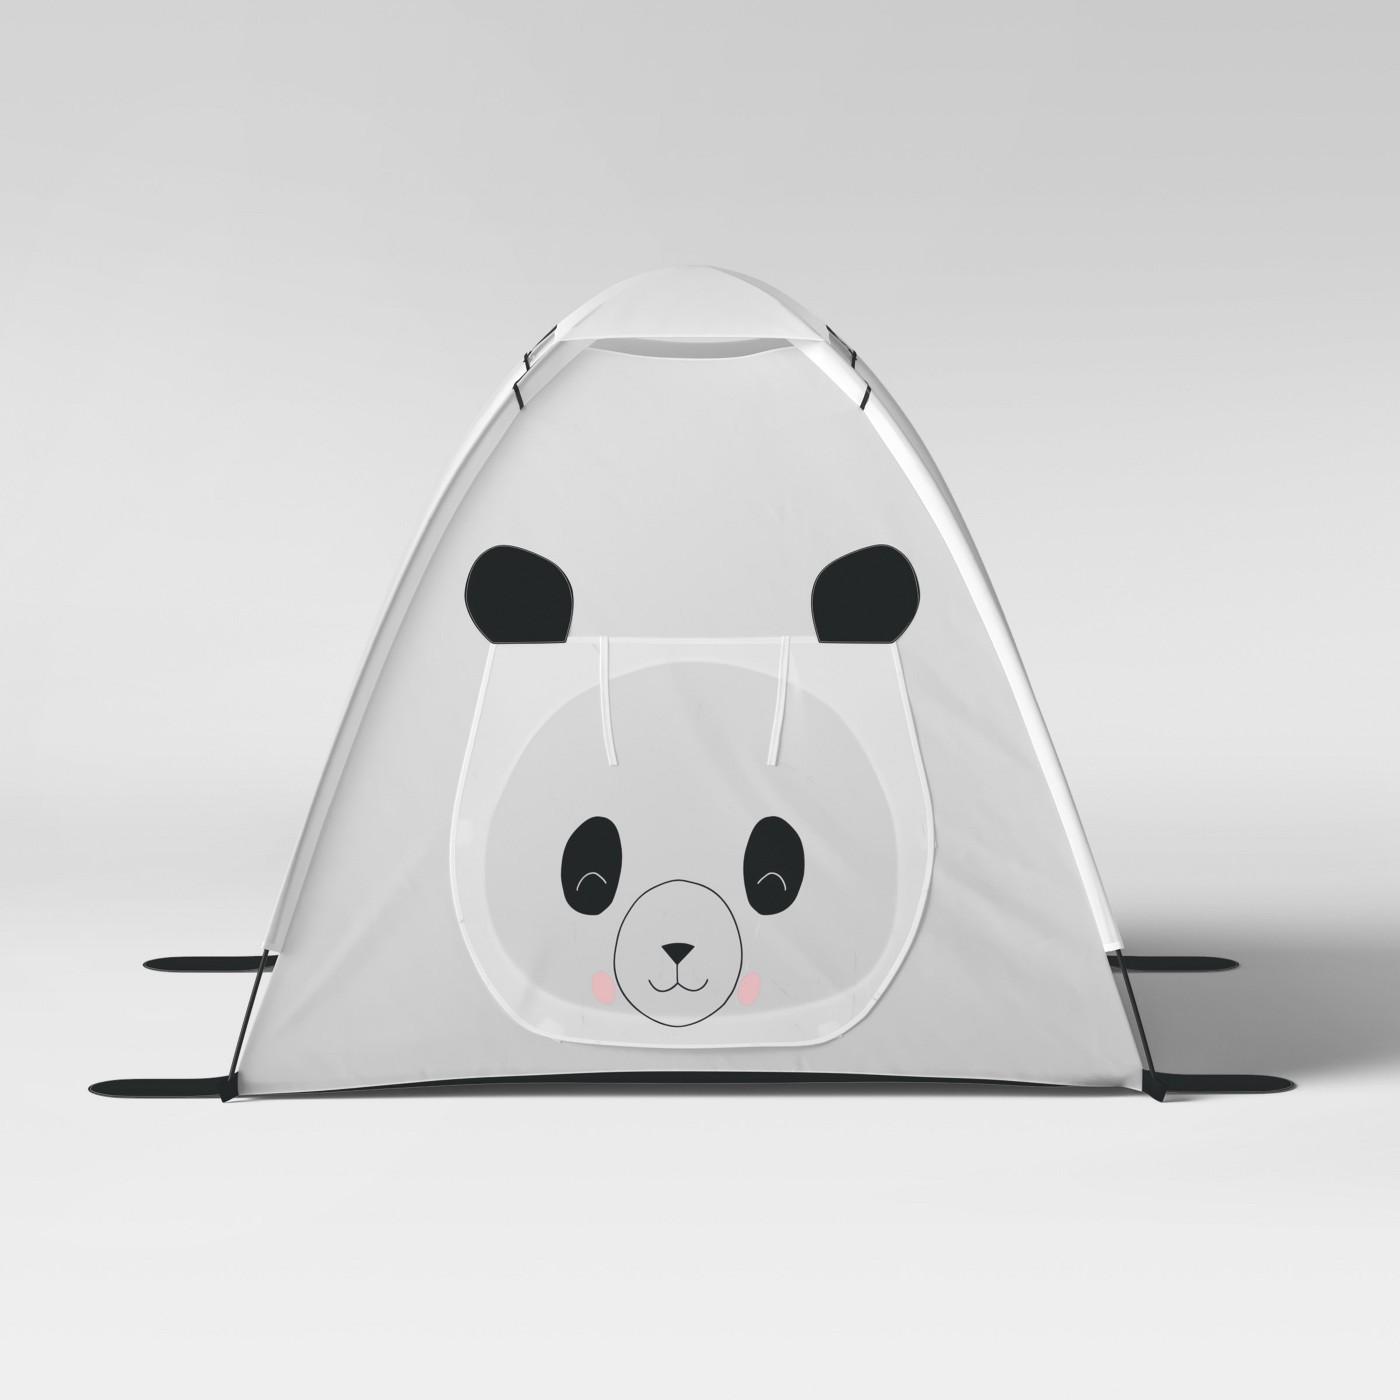 Panda Bear Play Tent - White - Pillowfort™ - image 1 of 4